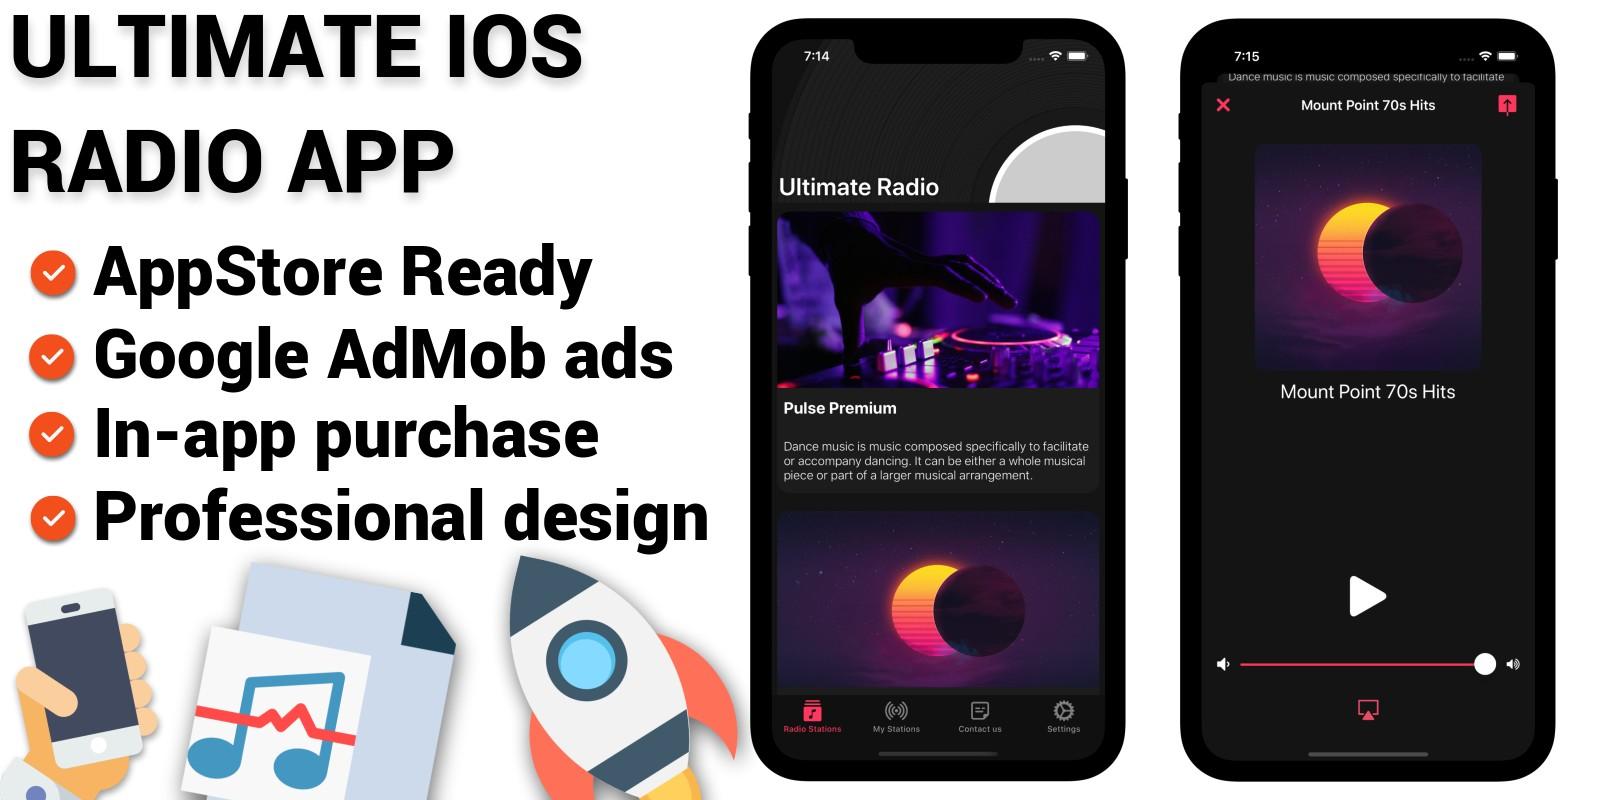 Ultimate iOS Radio App Template